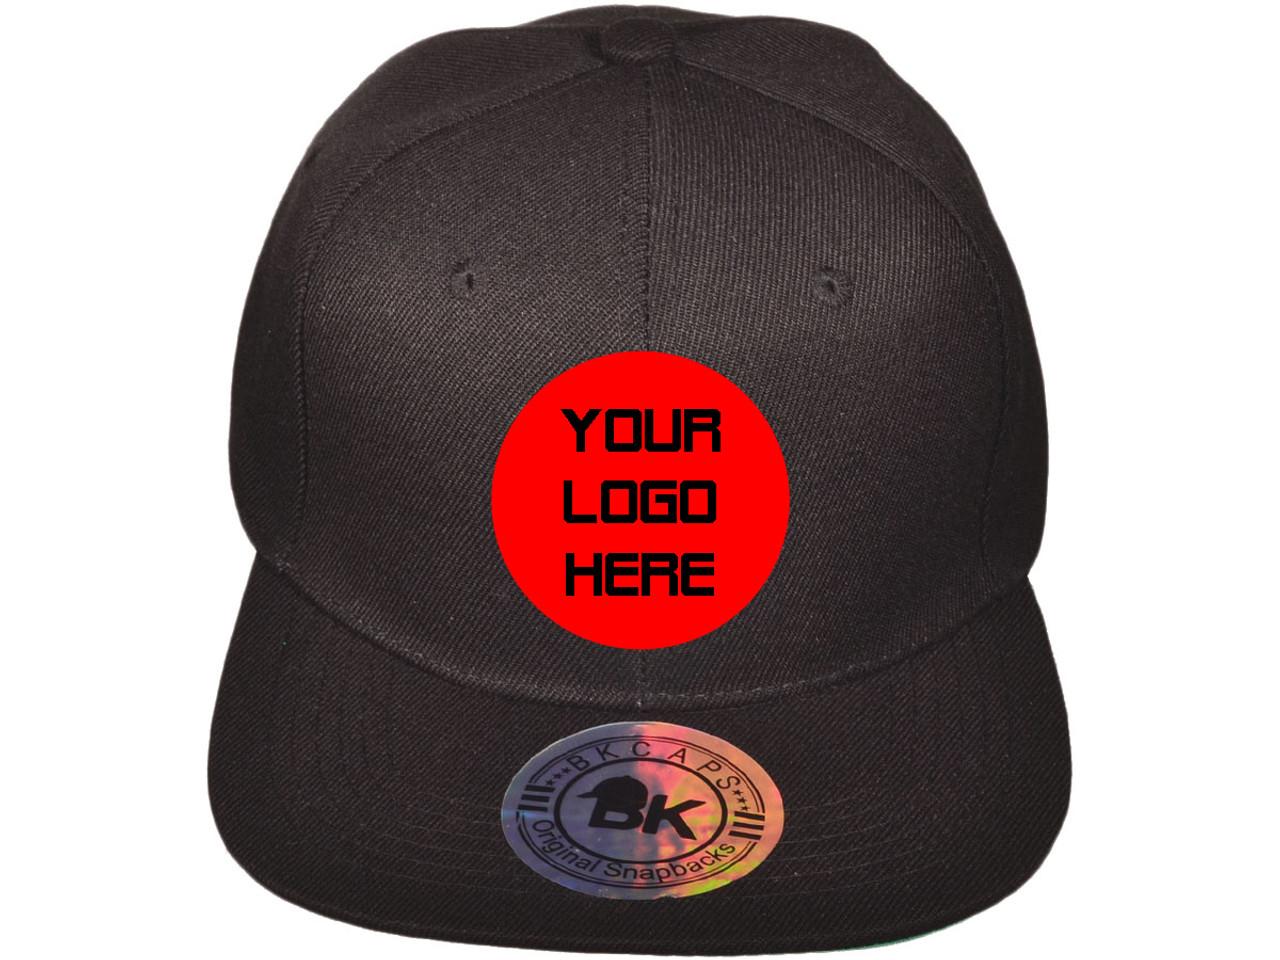 6e1f653e7862d Wholesale 576 pcs Custom or Personalized Hats Overseas Embroidered ...